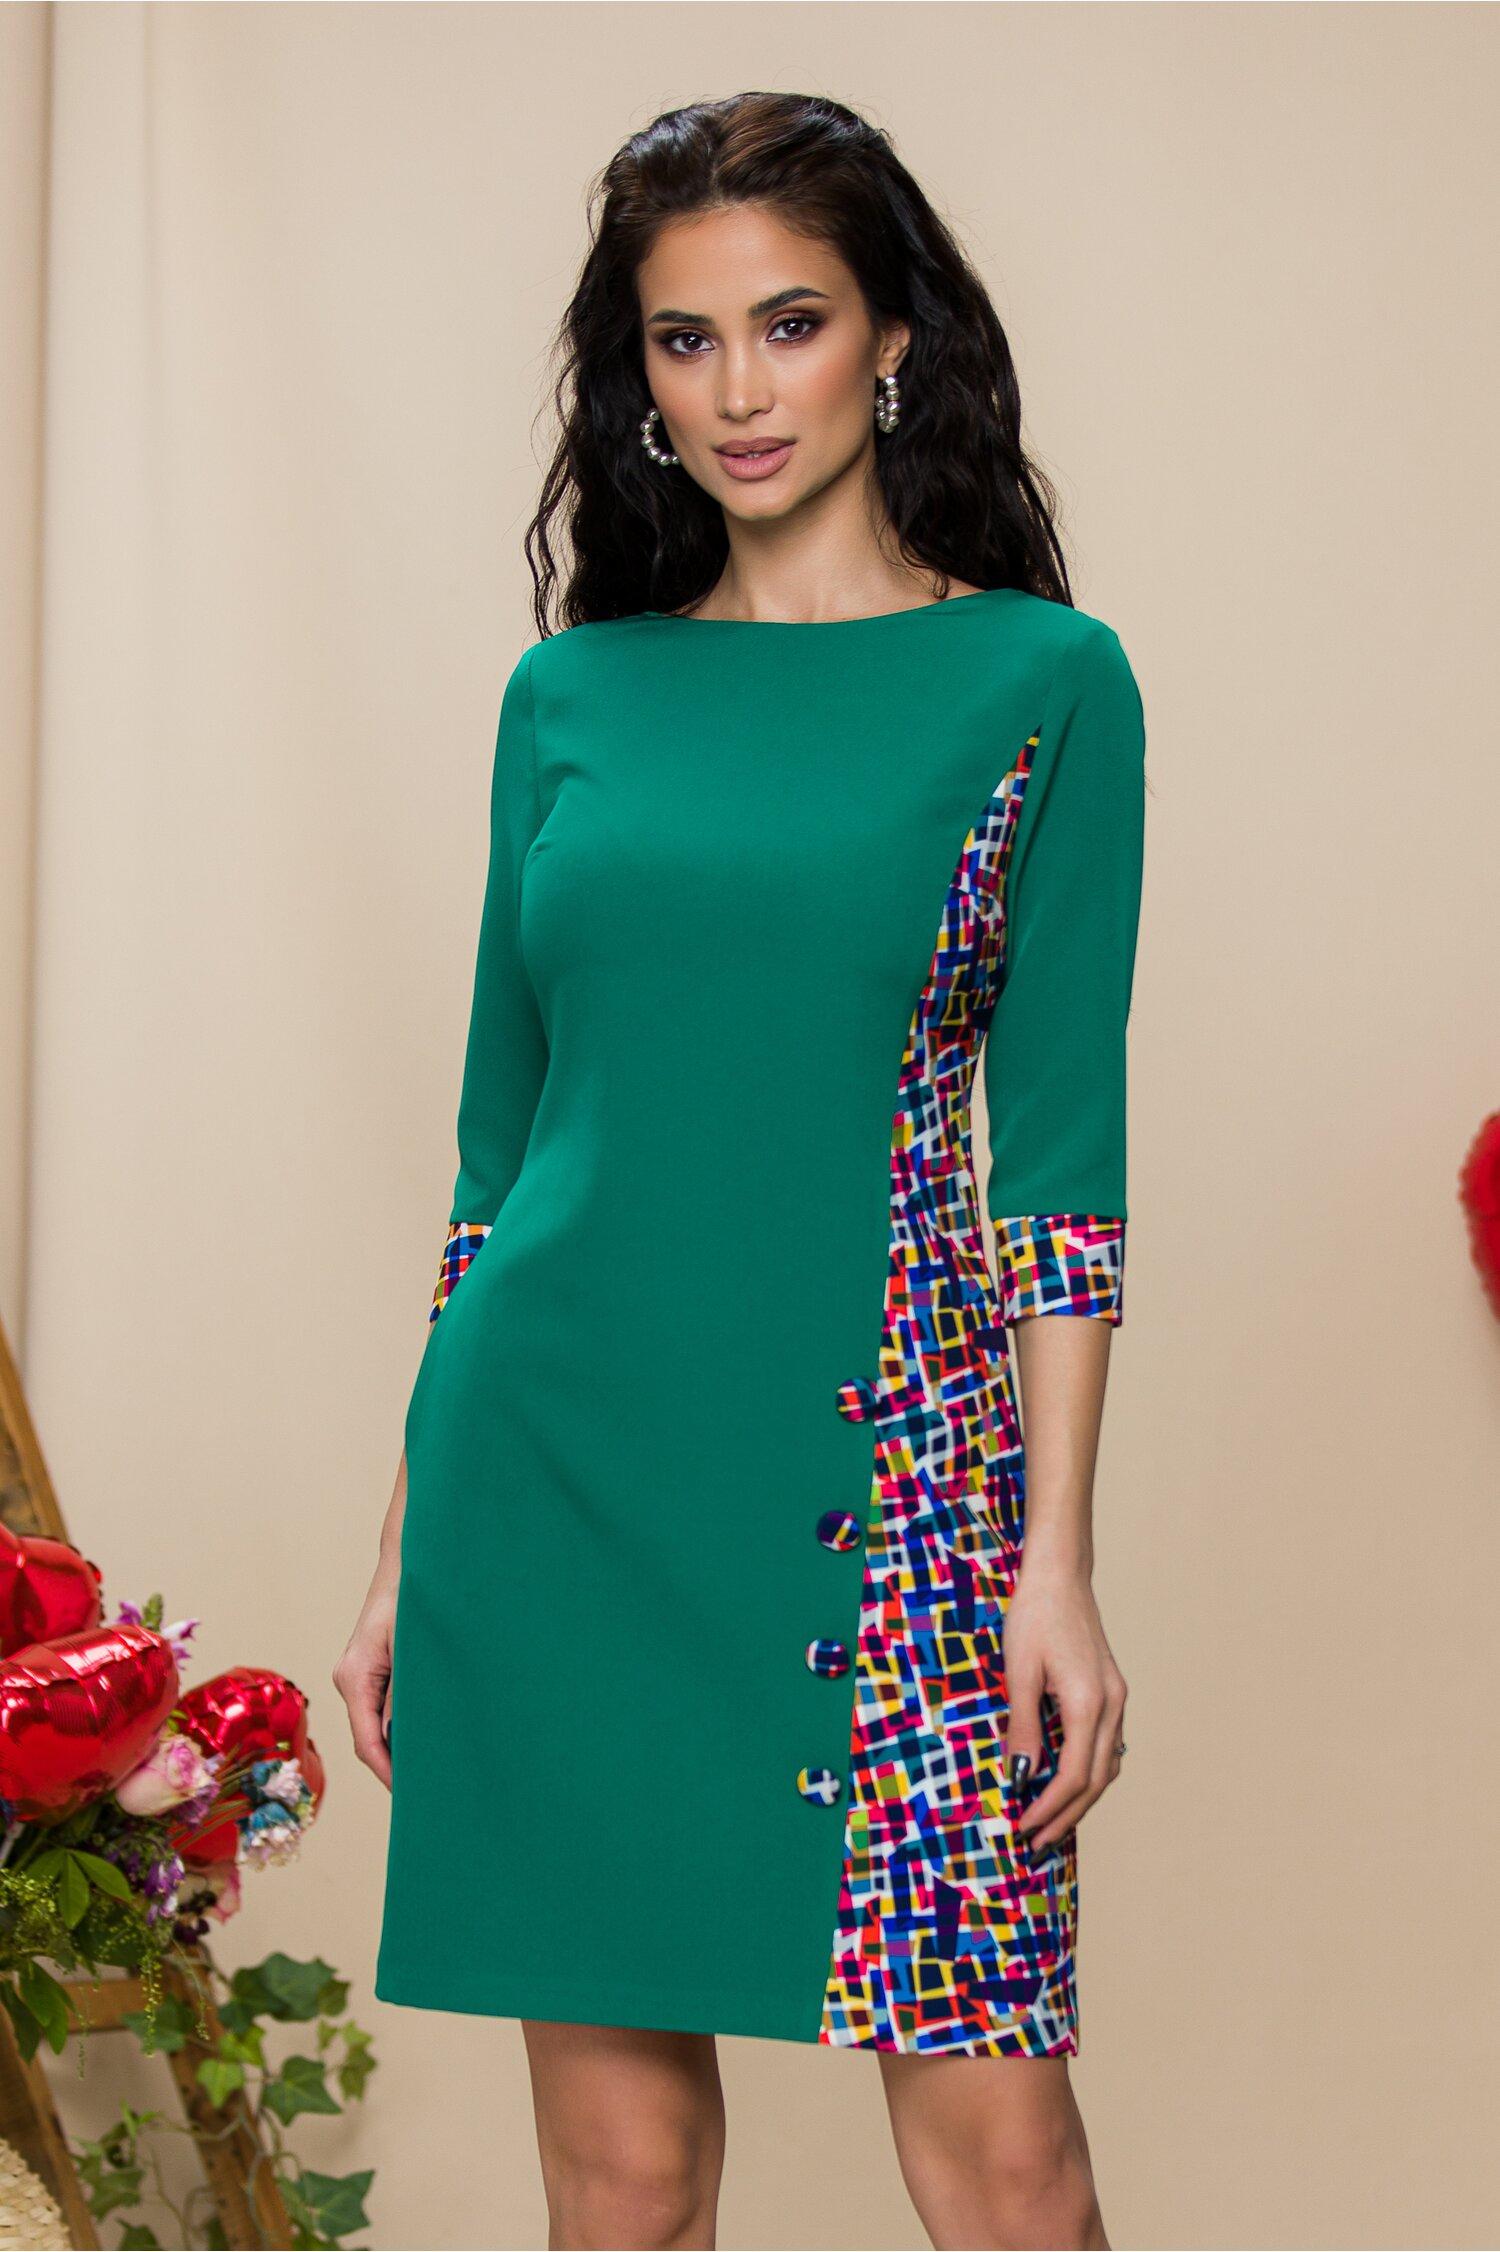 Rochie MBG verde cu imprimeu multicolor lateral